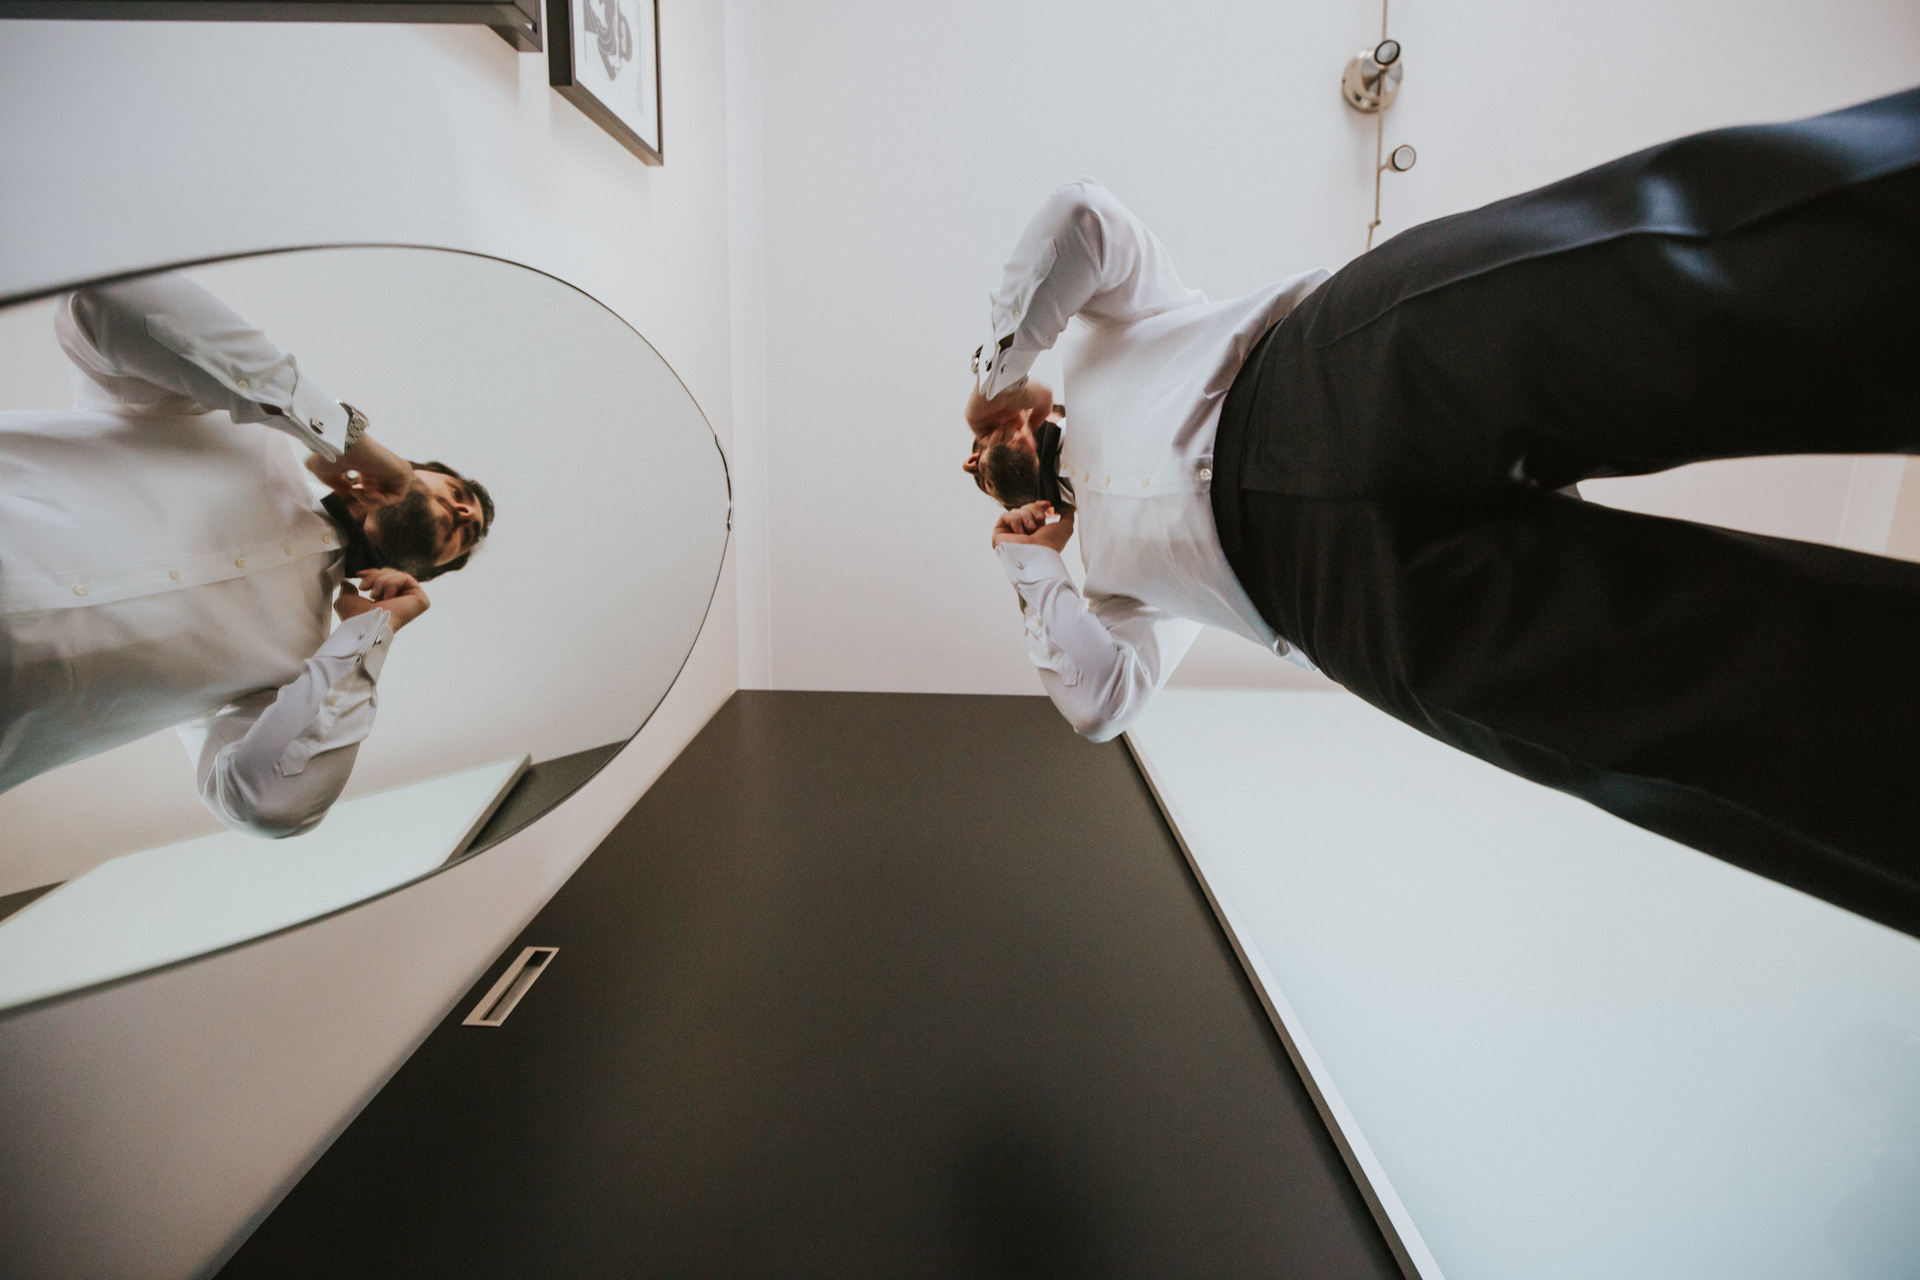 Turkey Elopement Photos | Seen from below, the groom adjusts his bowtie in the mirror